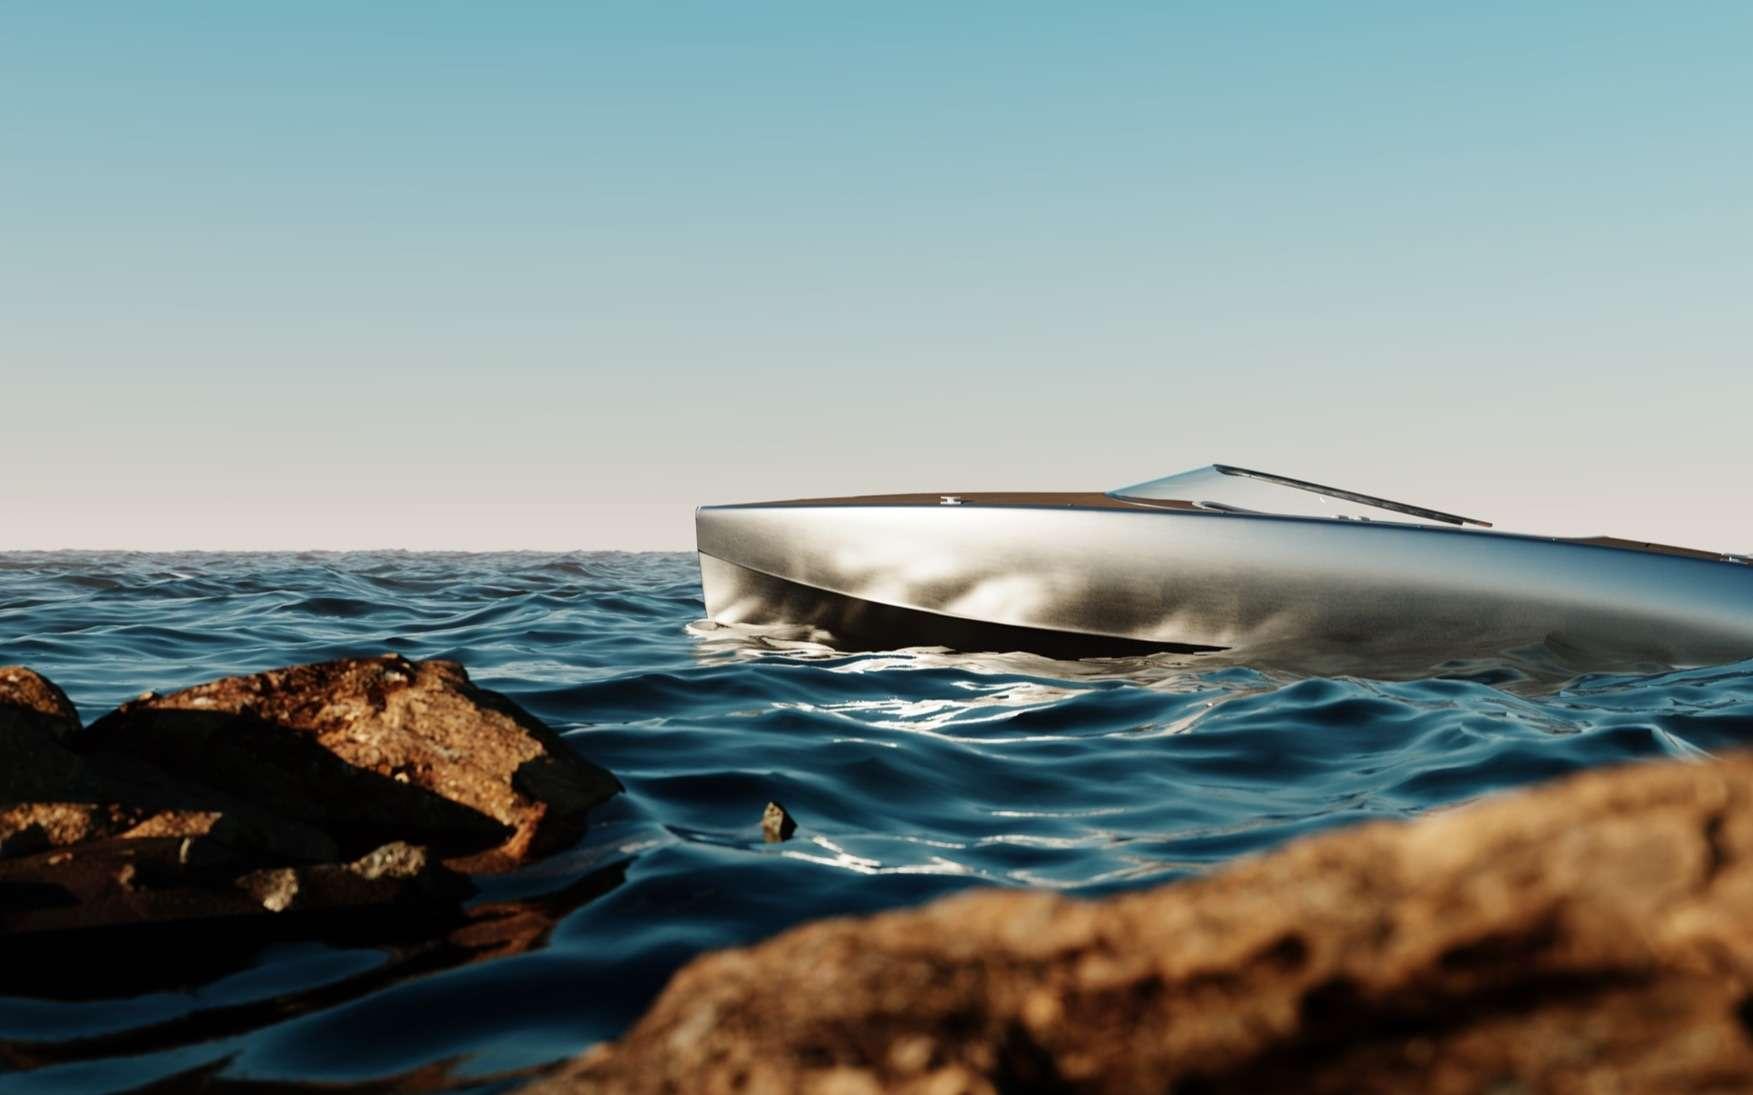 Le Sarvo37 et sa superbe coque en aluminium brossé. © Sarvo Marine